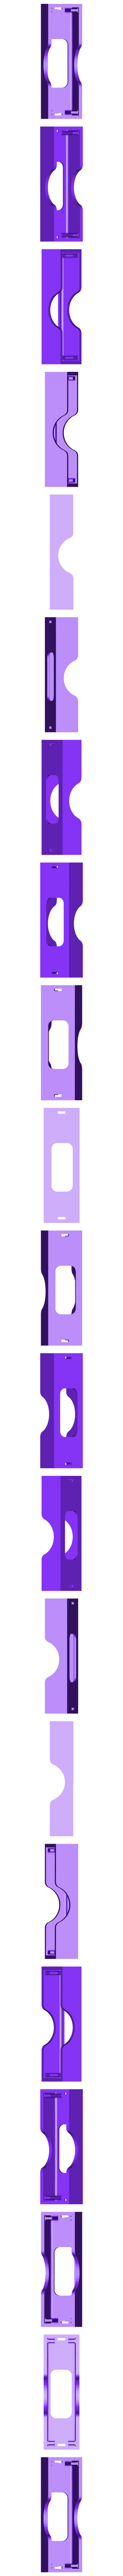 box_for_battery.stl Download free STL file Fireplace • 3D printing design, TanyaAkinora